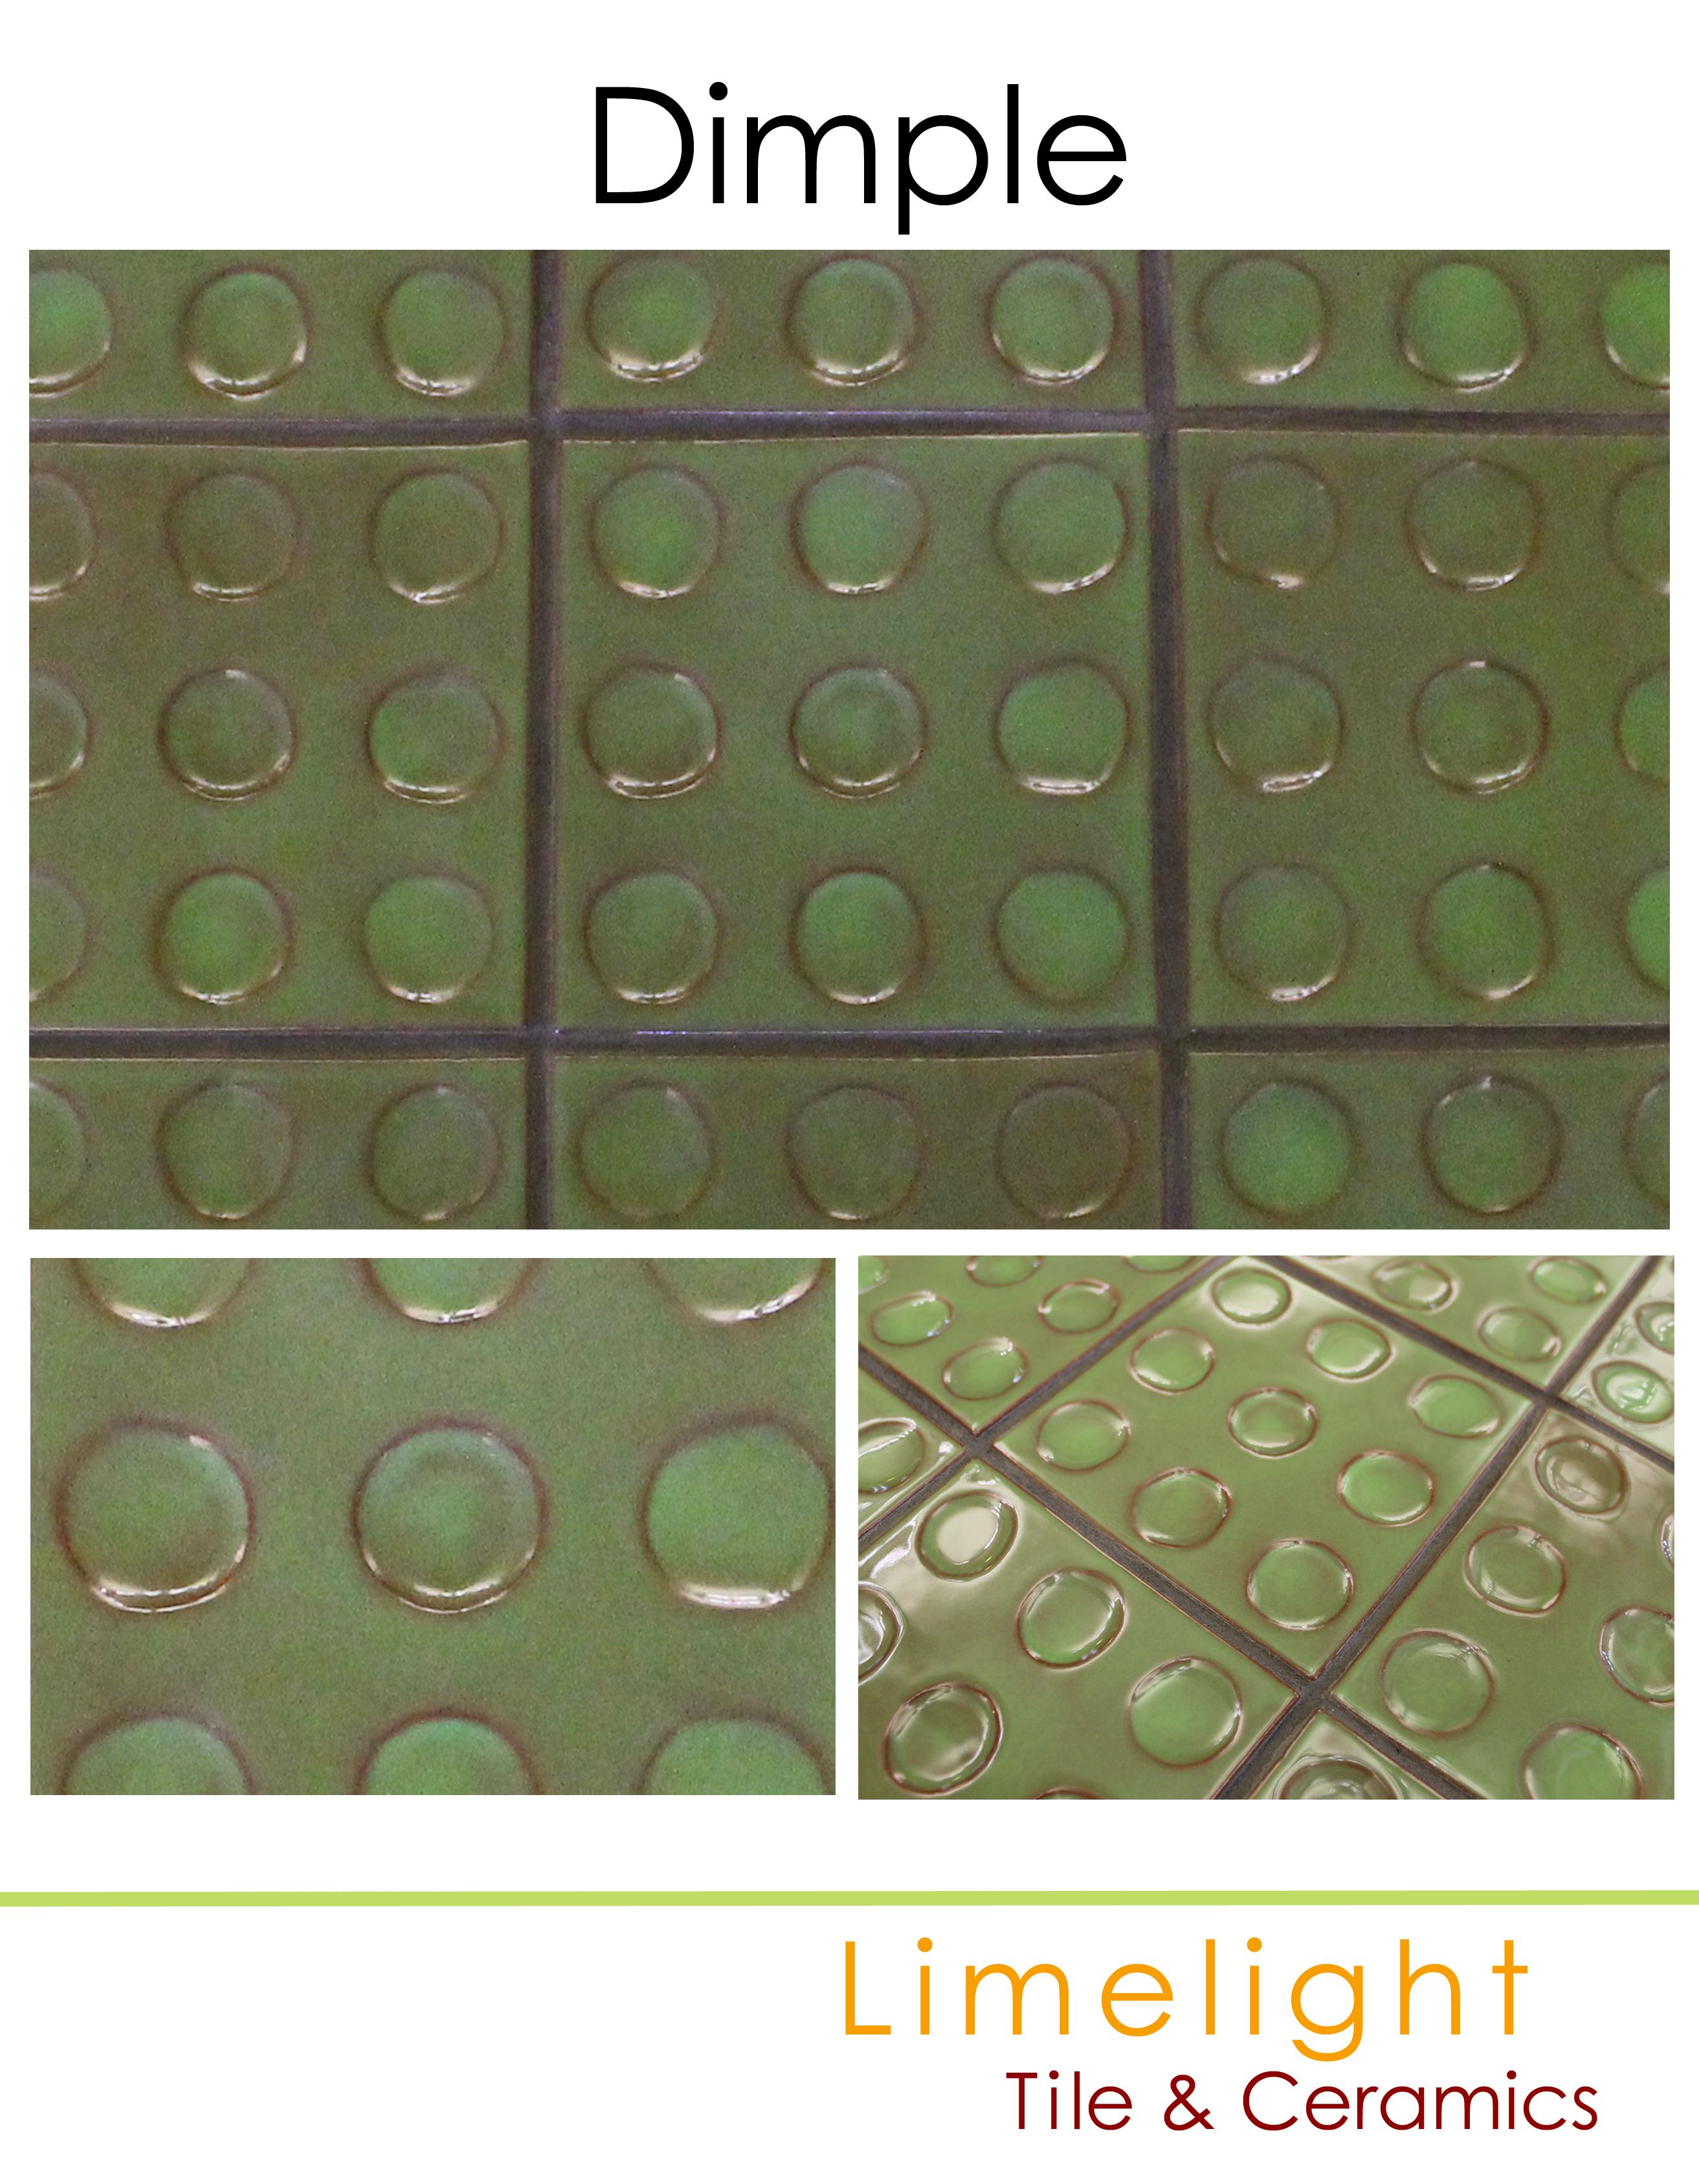 dimple limelight tile ceramics